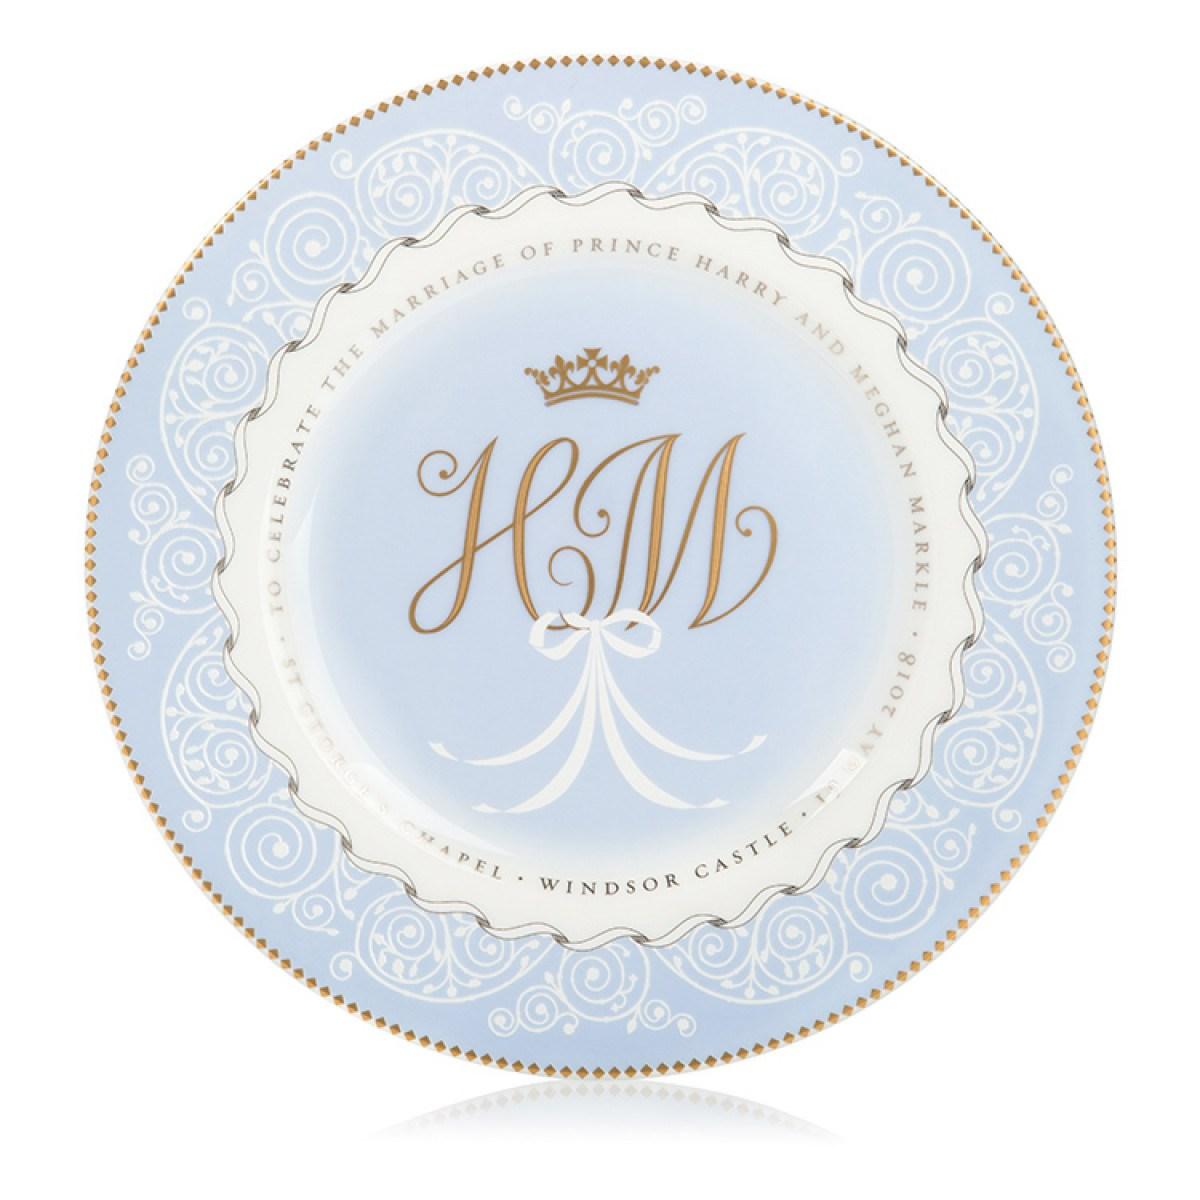 Prince Harry and Meghan Markle plate